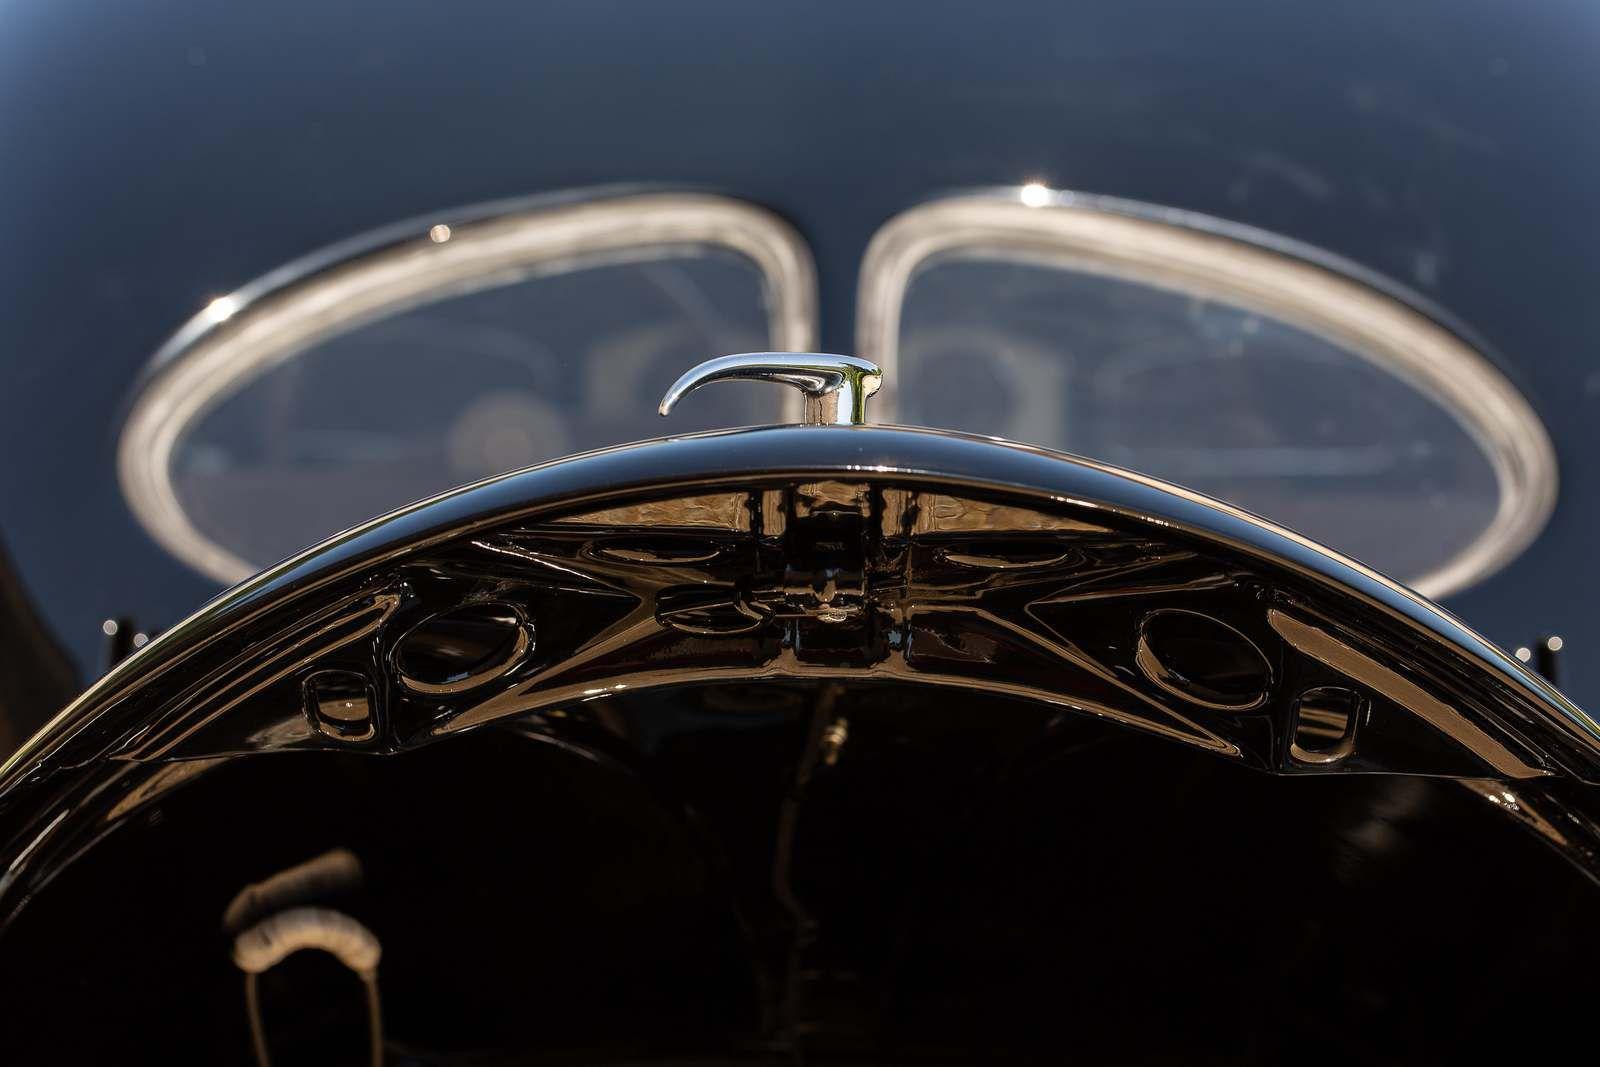 A Vendre : VW Split  Bretzel  Binocle 1950  1952